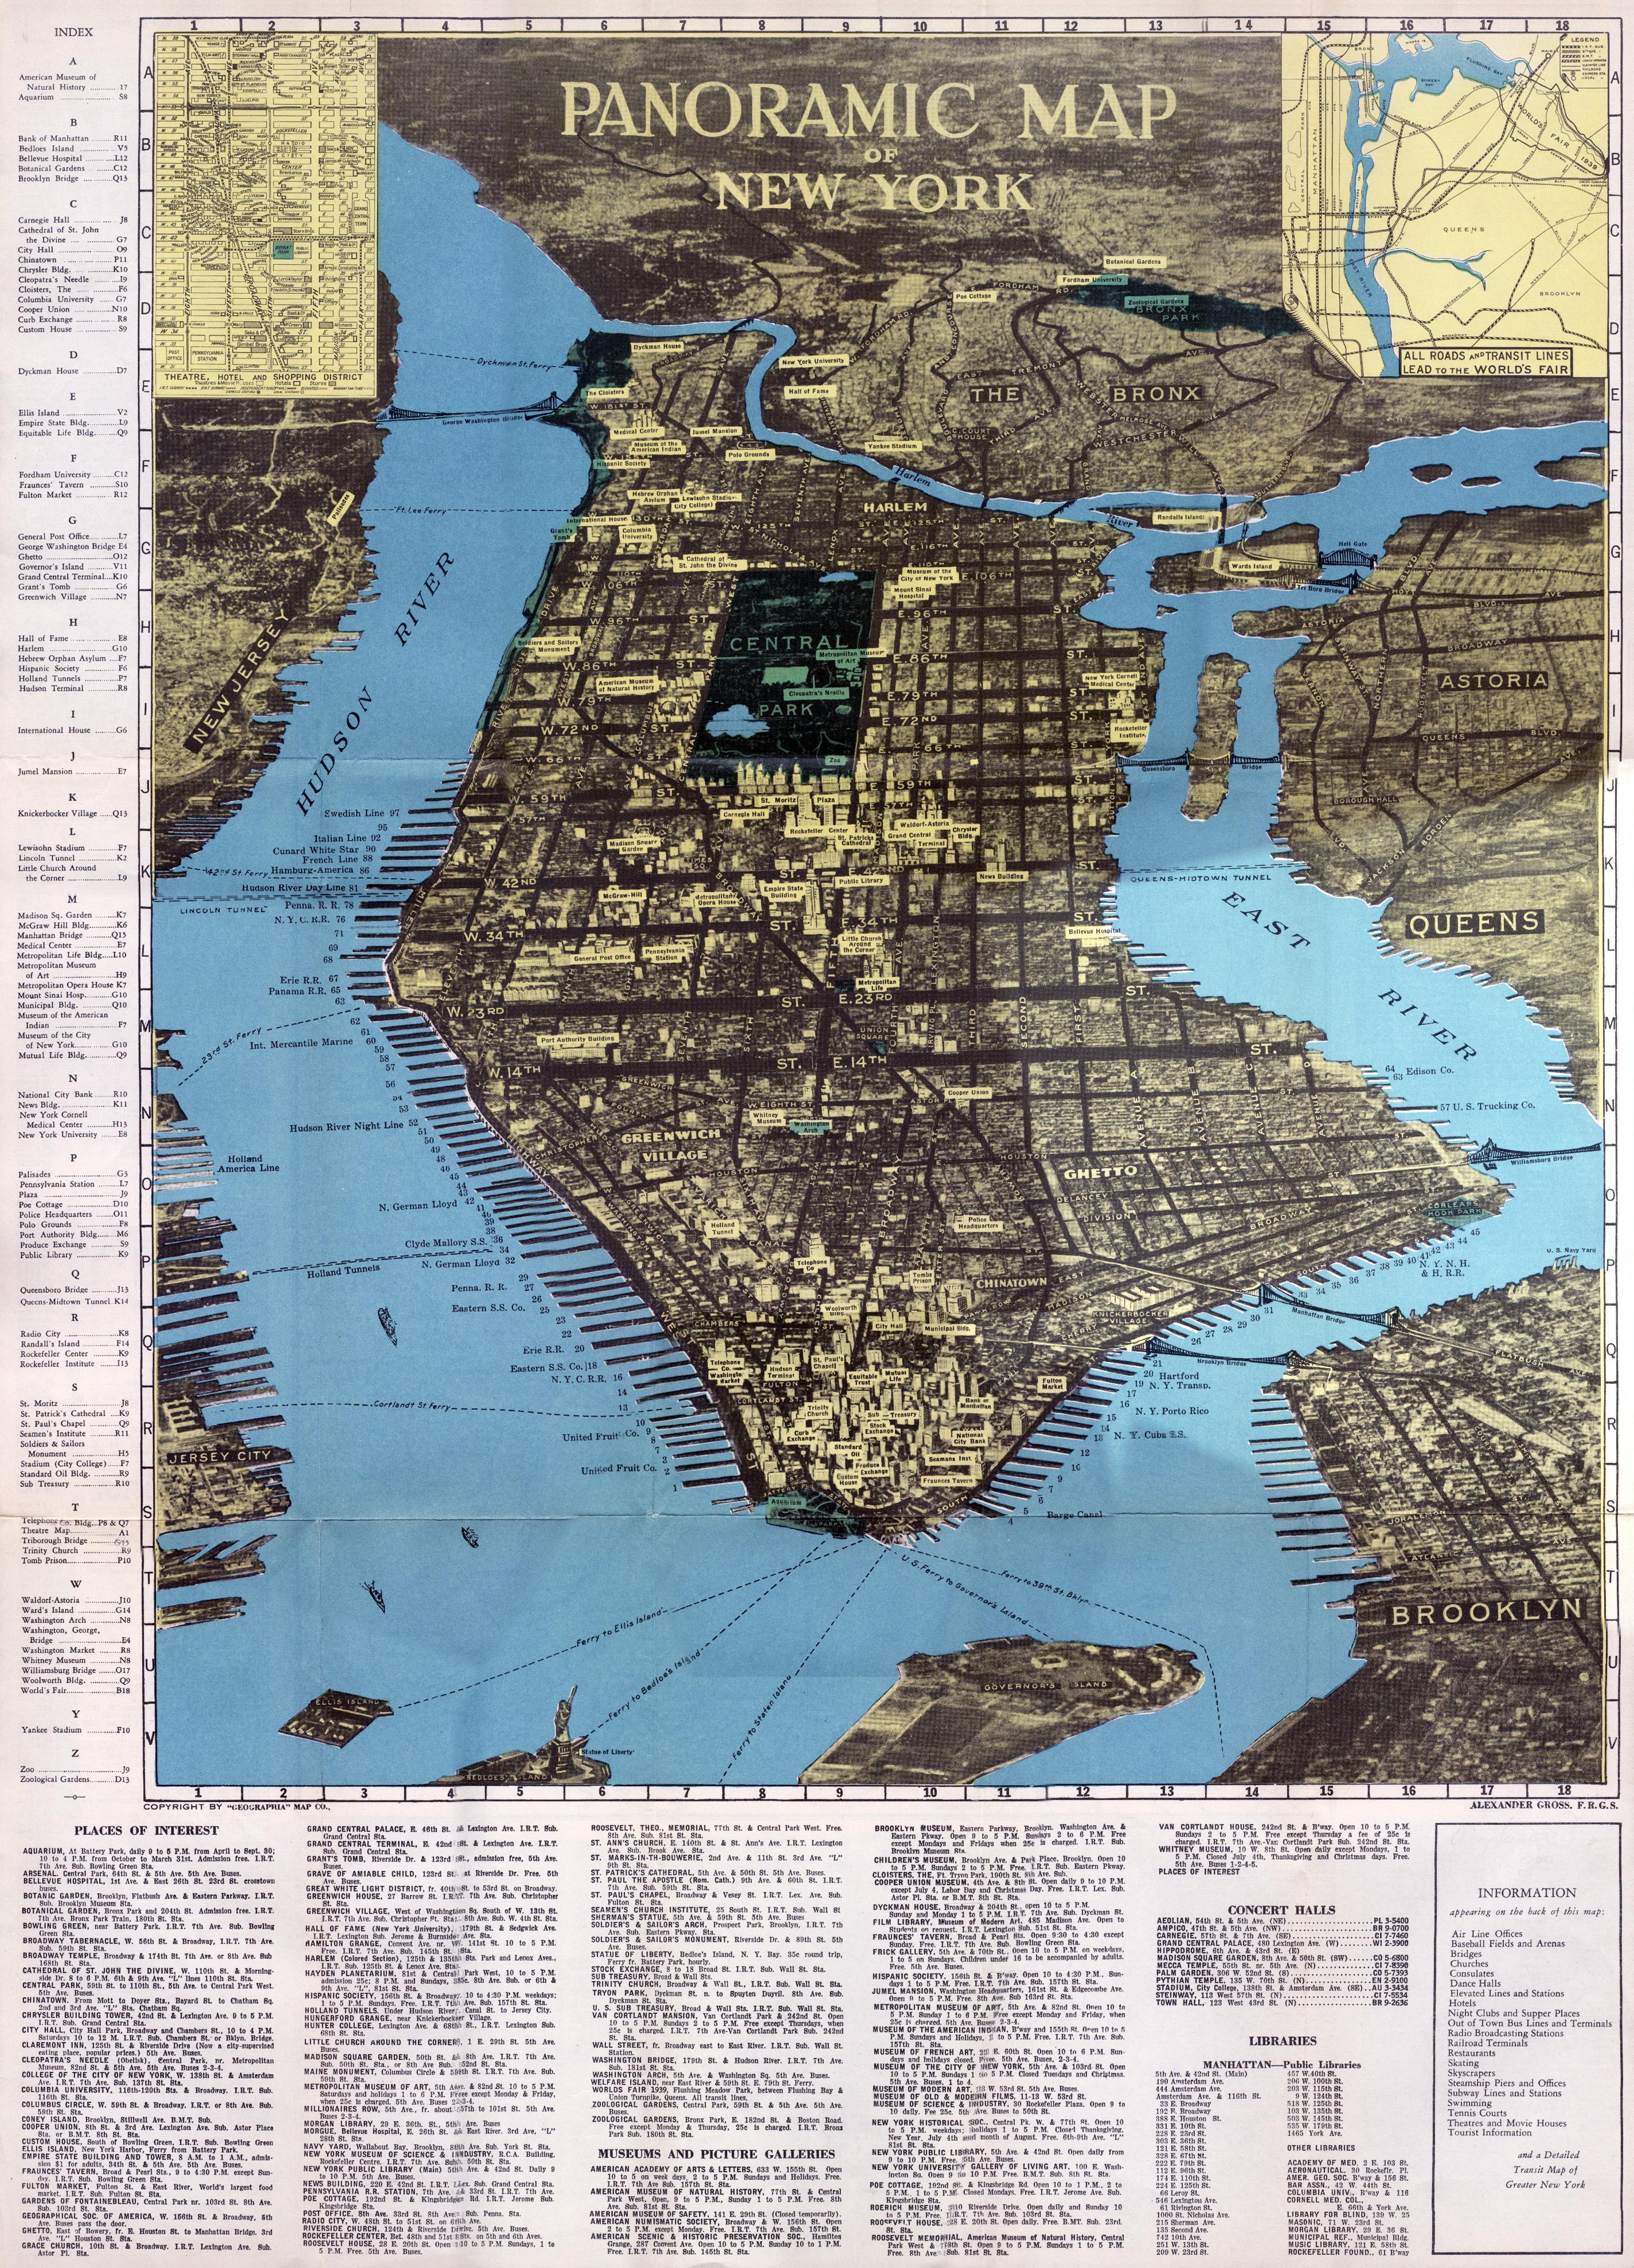 Large scale panoramic map of Manhattam, New York city | New ...